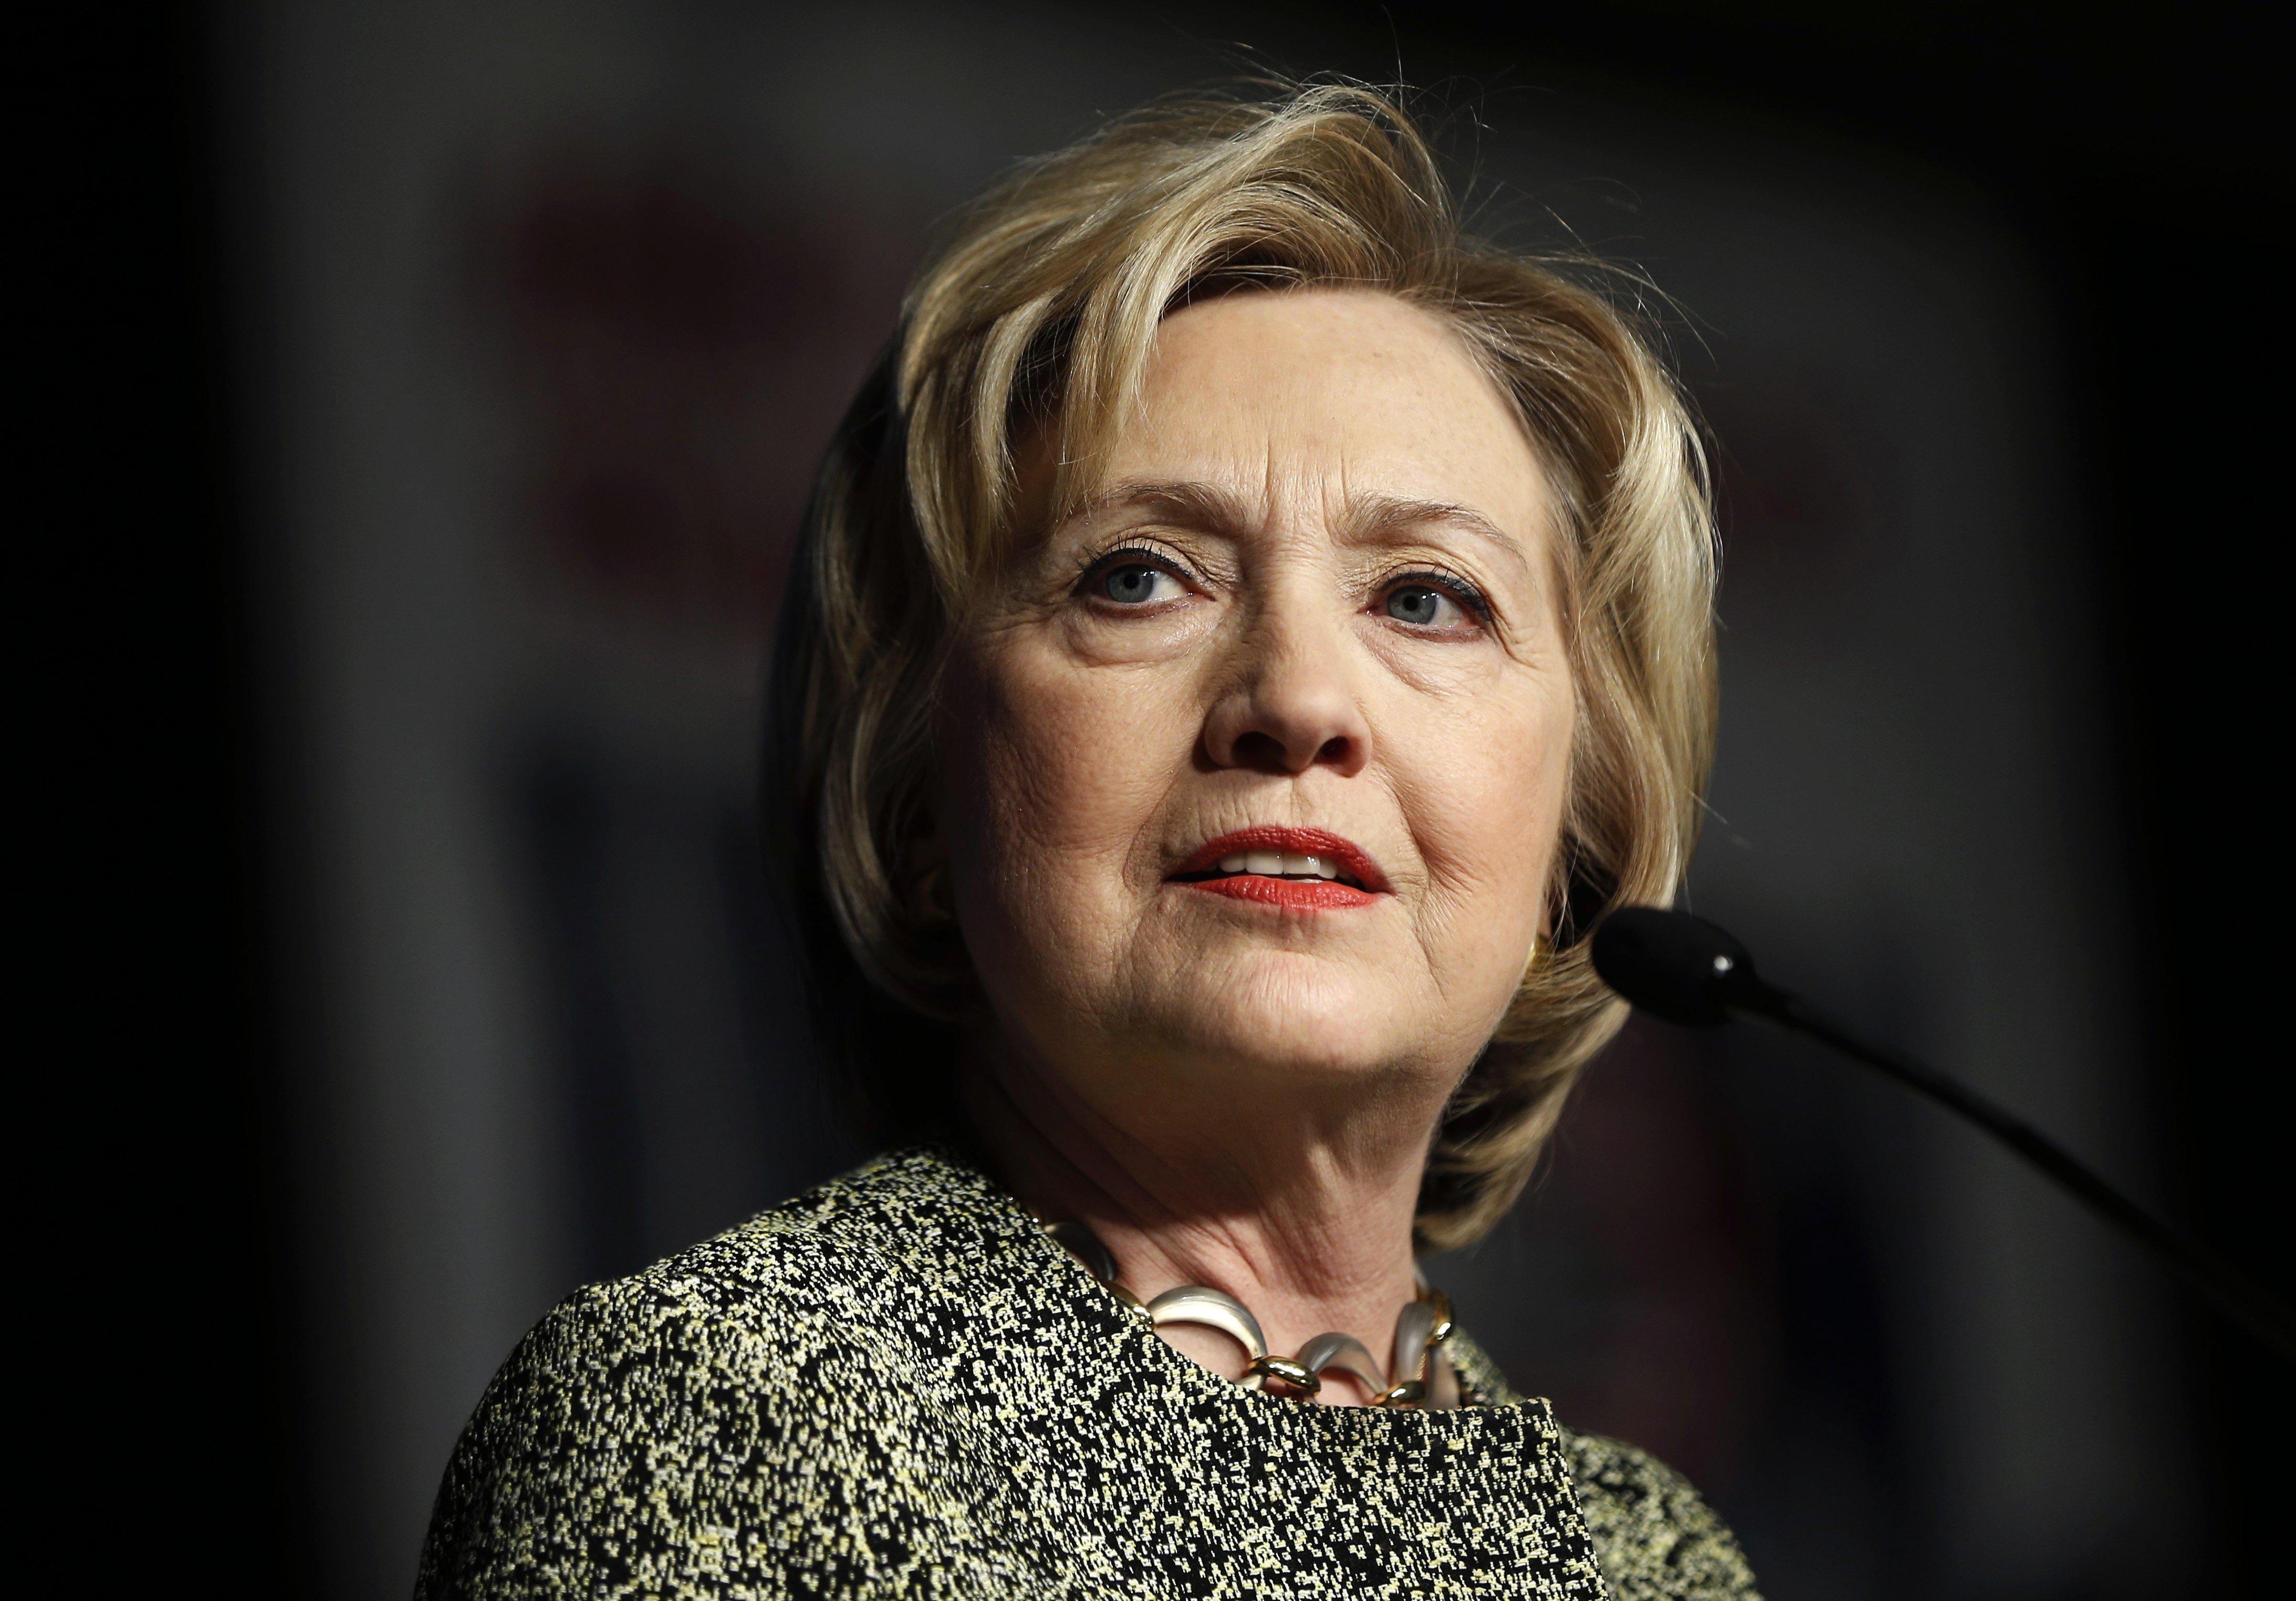 Hillary Clinton speaks at the Pennsylvania AFL-CIO Convention in Philadelphia on April 6, 2016.